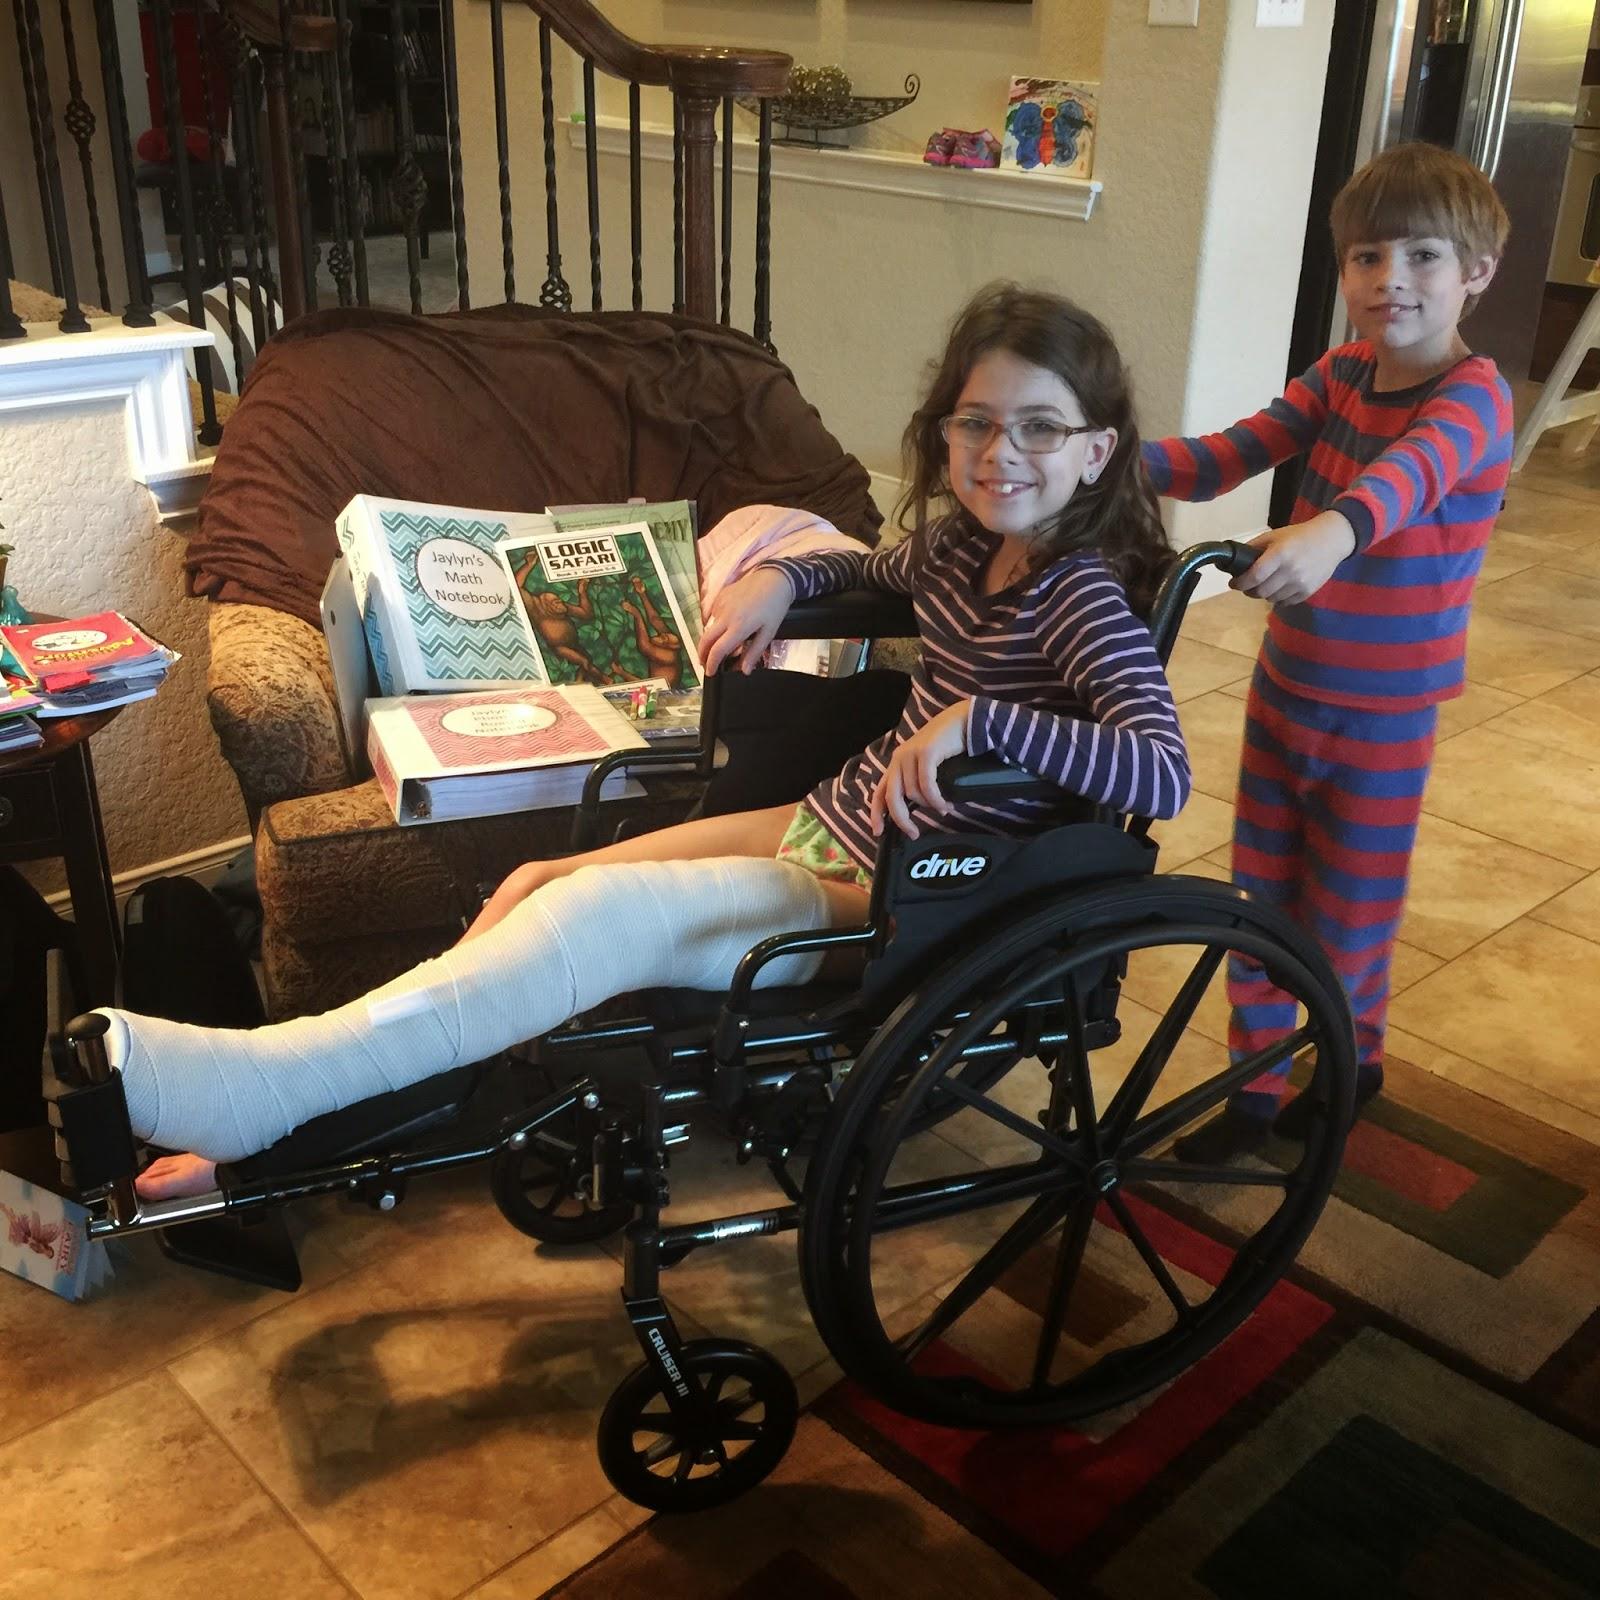 The Broken Leg Homeschool Life Lextin Eclectic